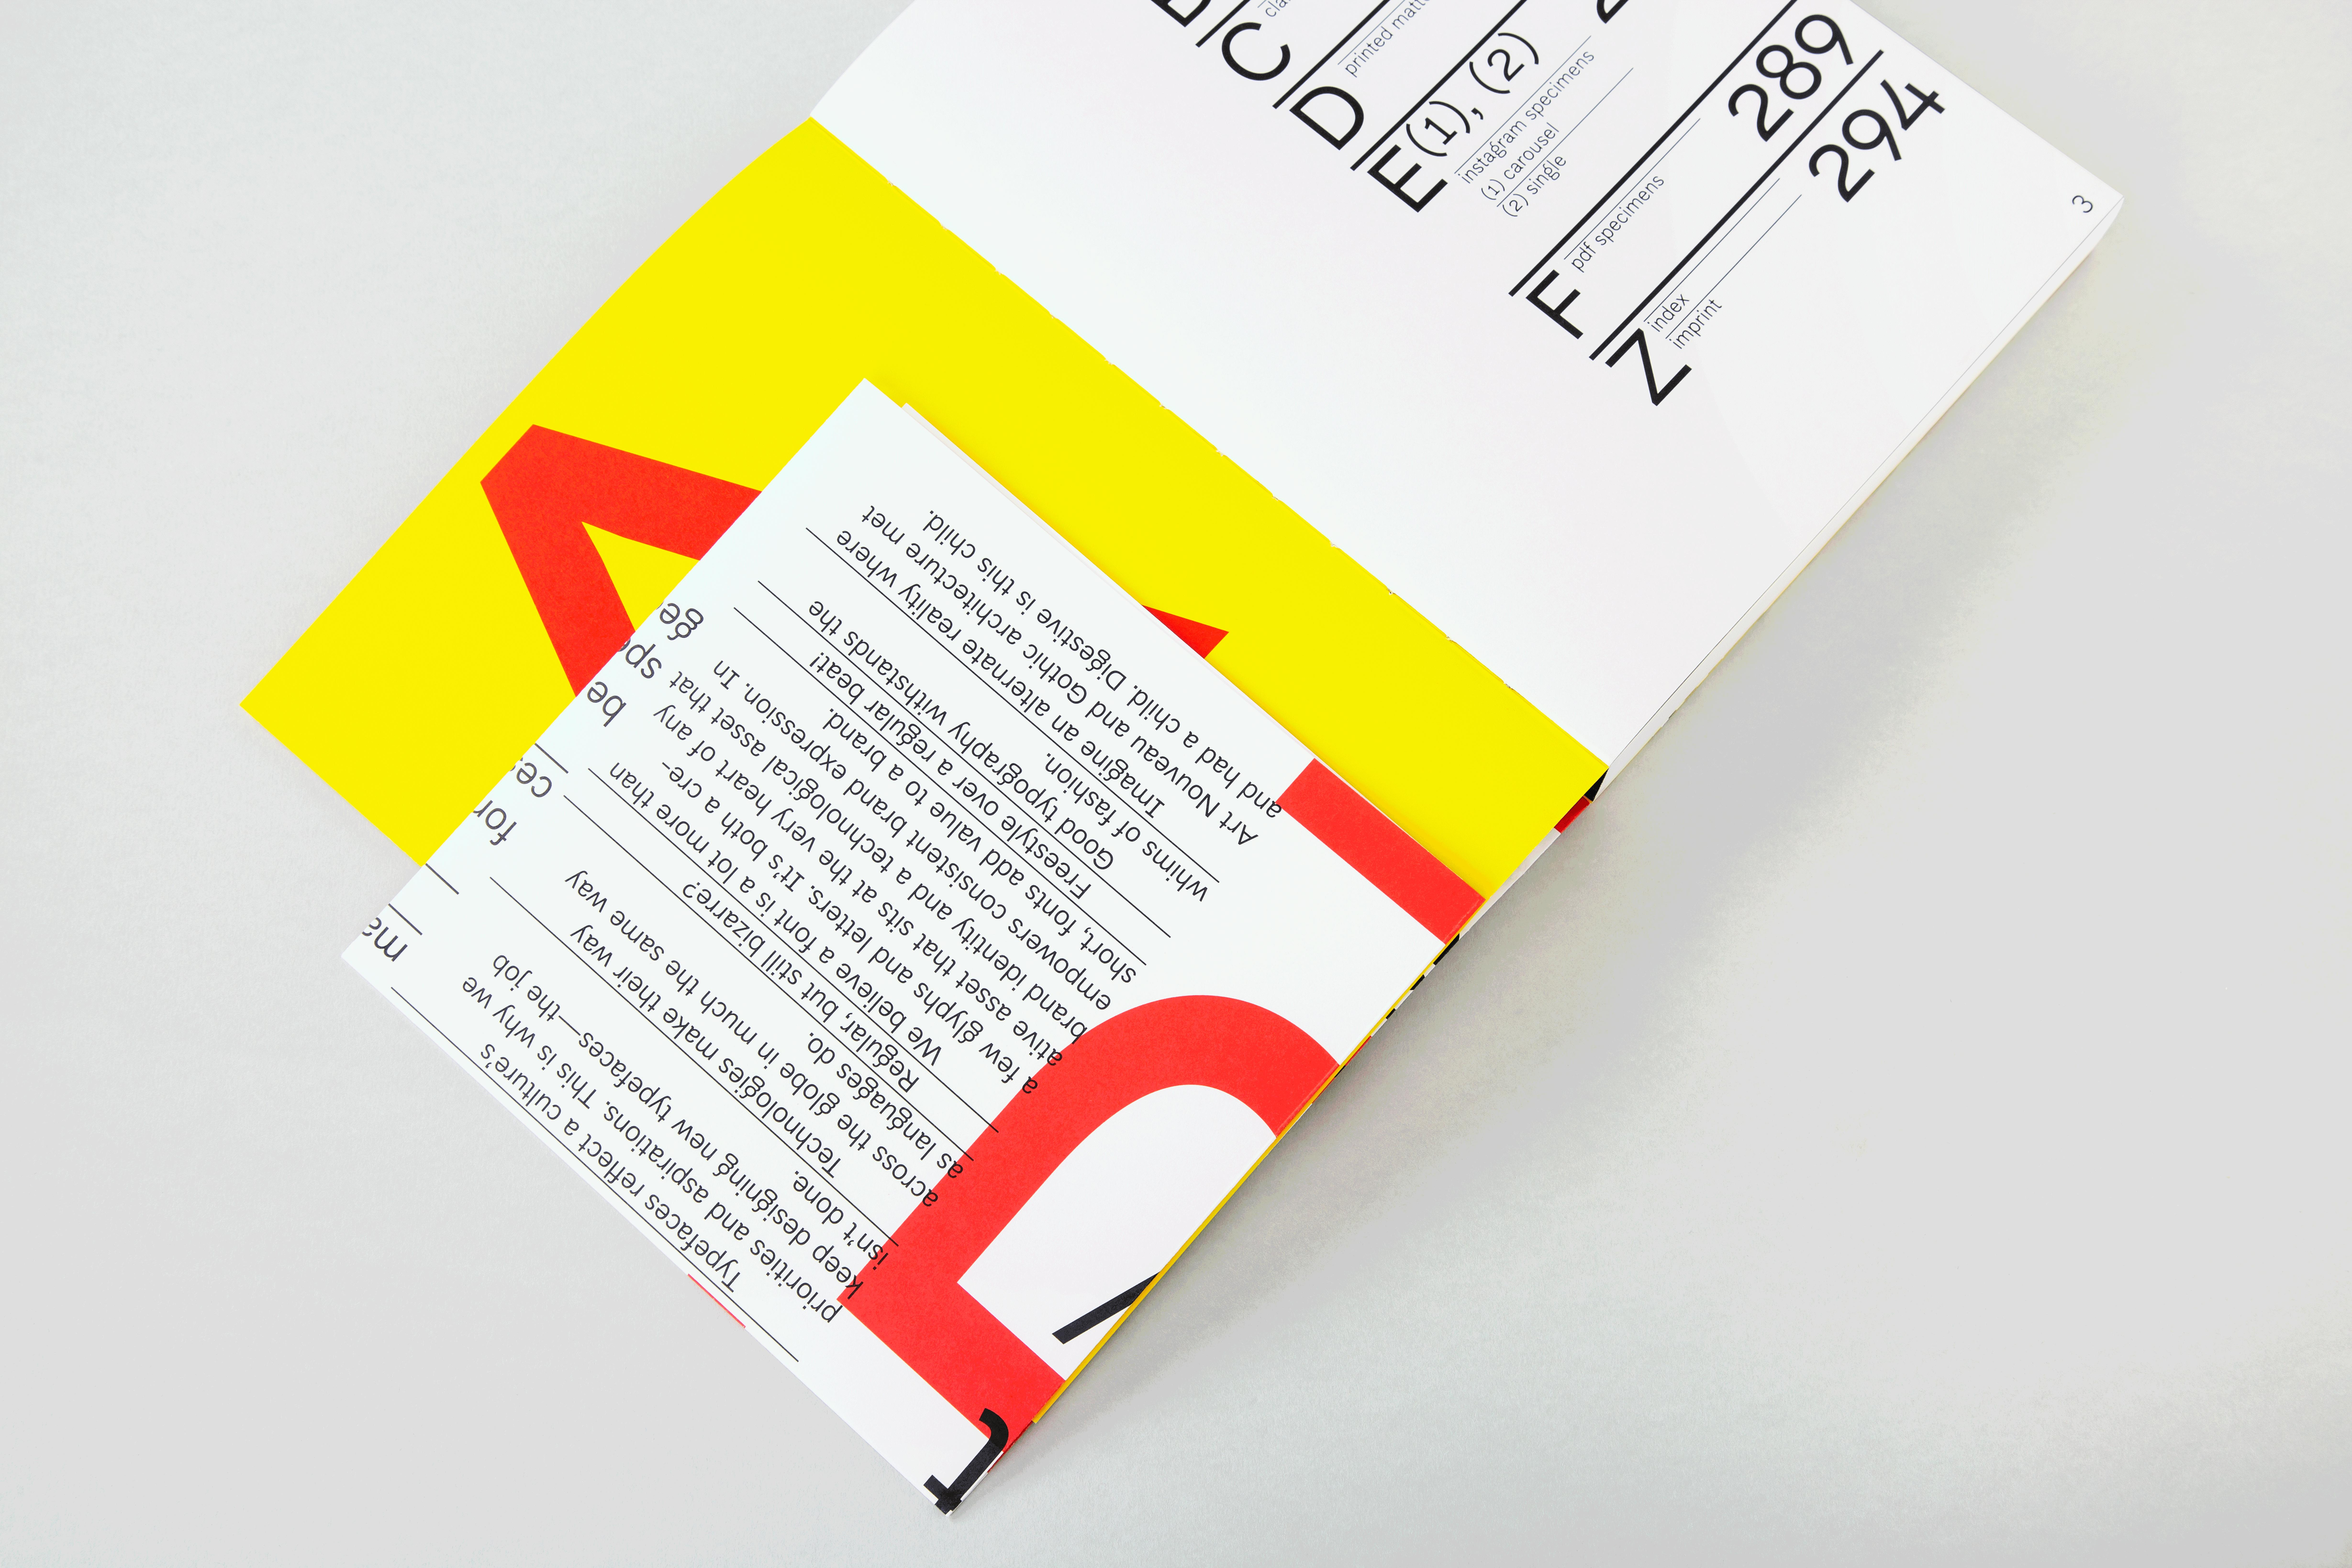 Slanted-Publiaktionen-Slanted-Publishers-Support-Independent-Type_03